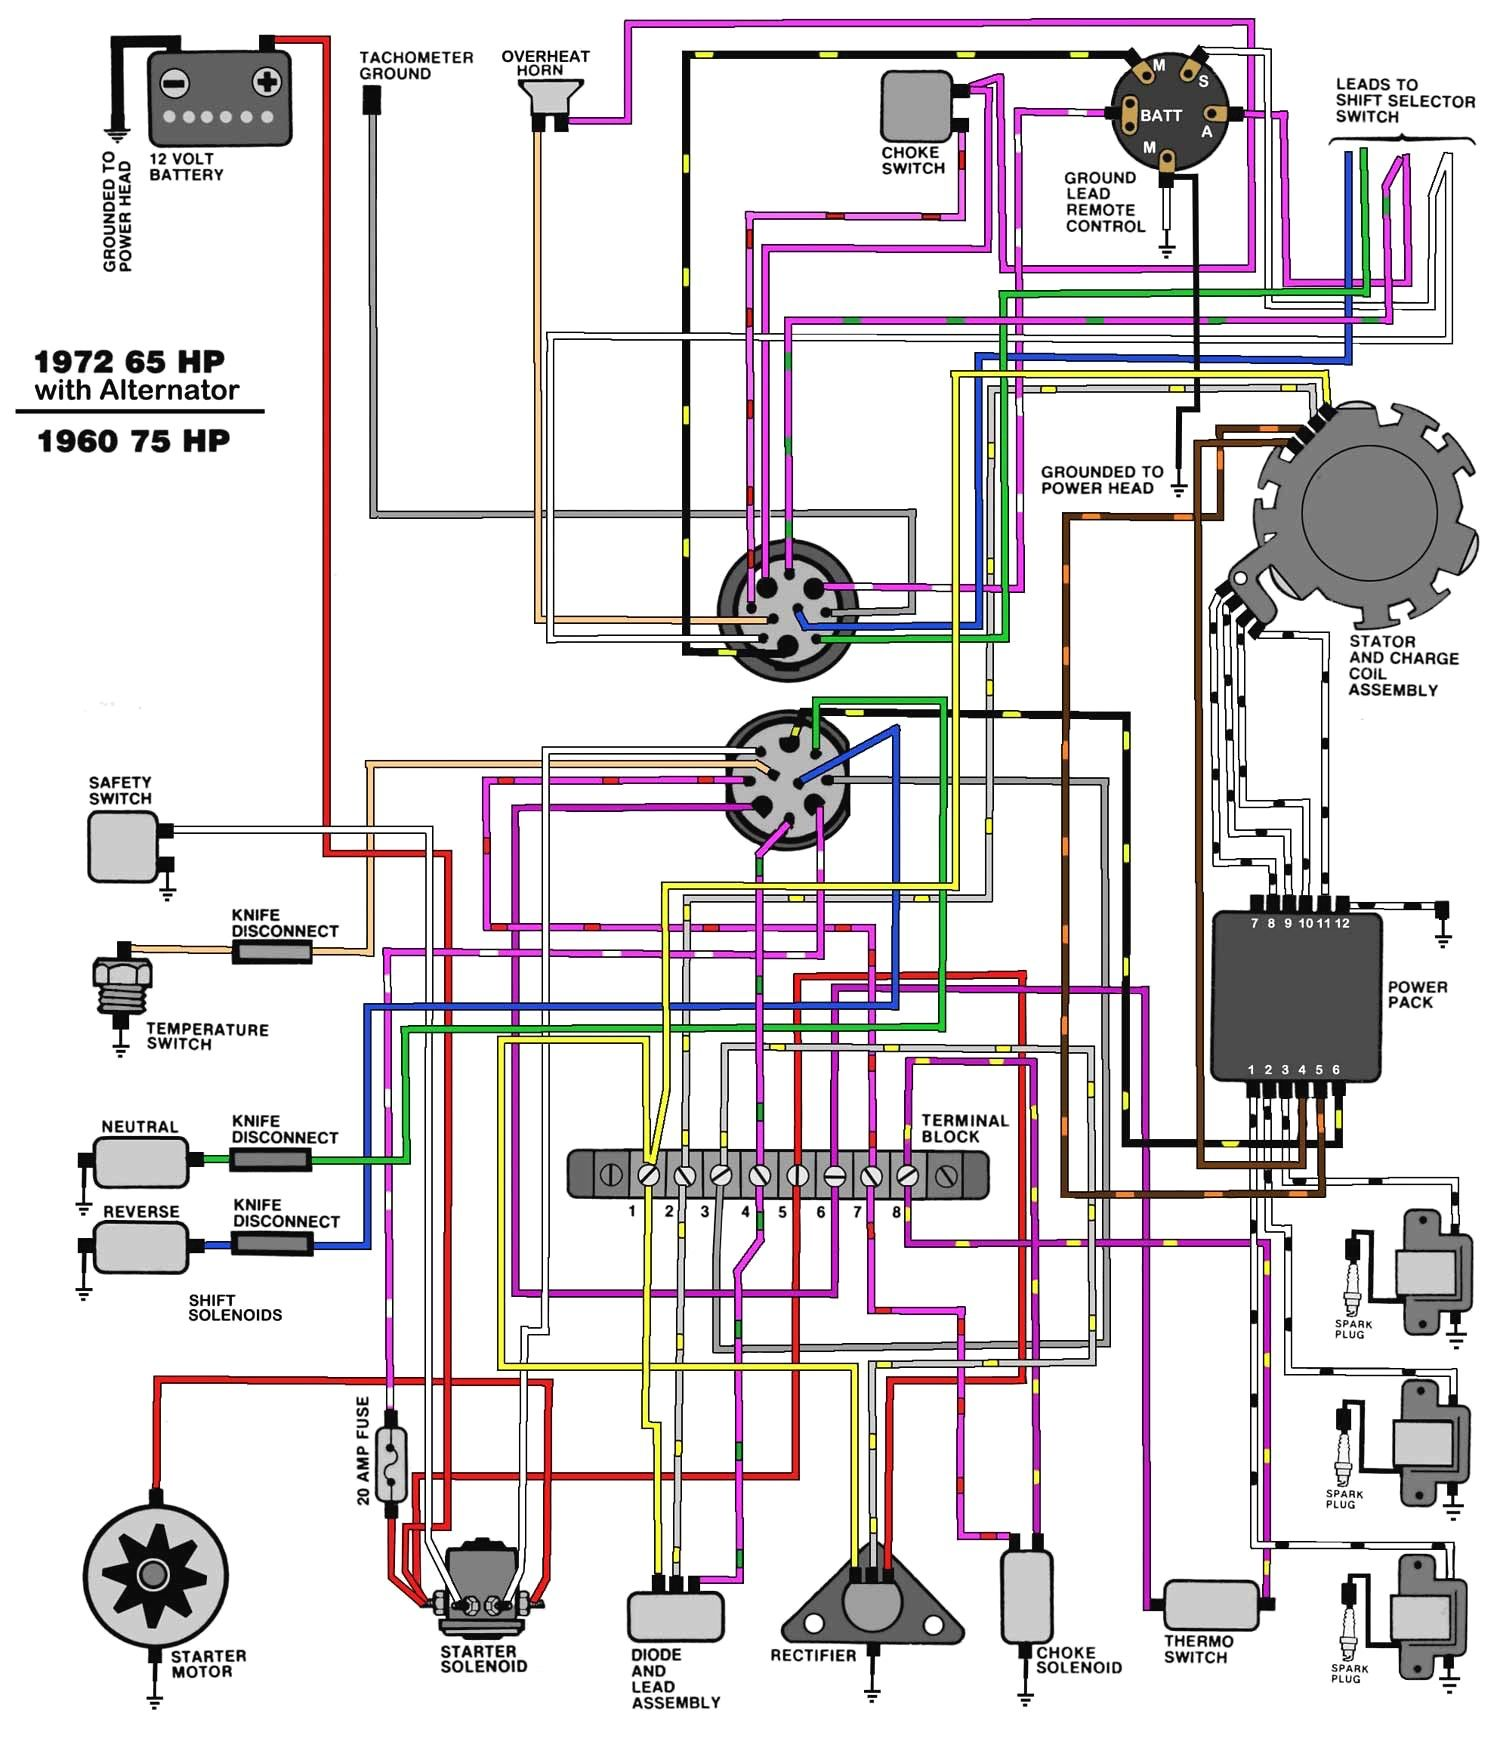 medium resolution of 65 hp mercury outboard motor wiring diagram diagrams schematics for